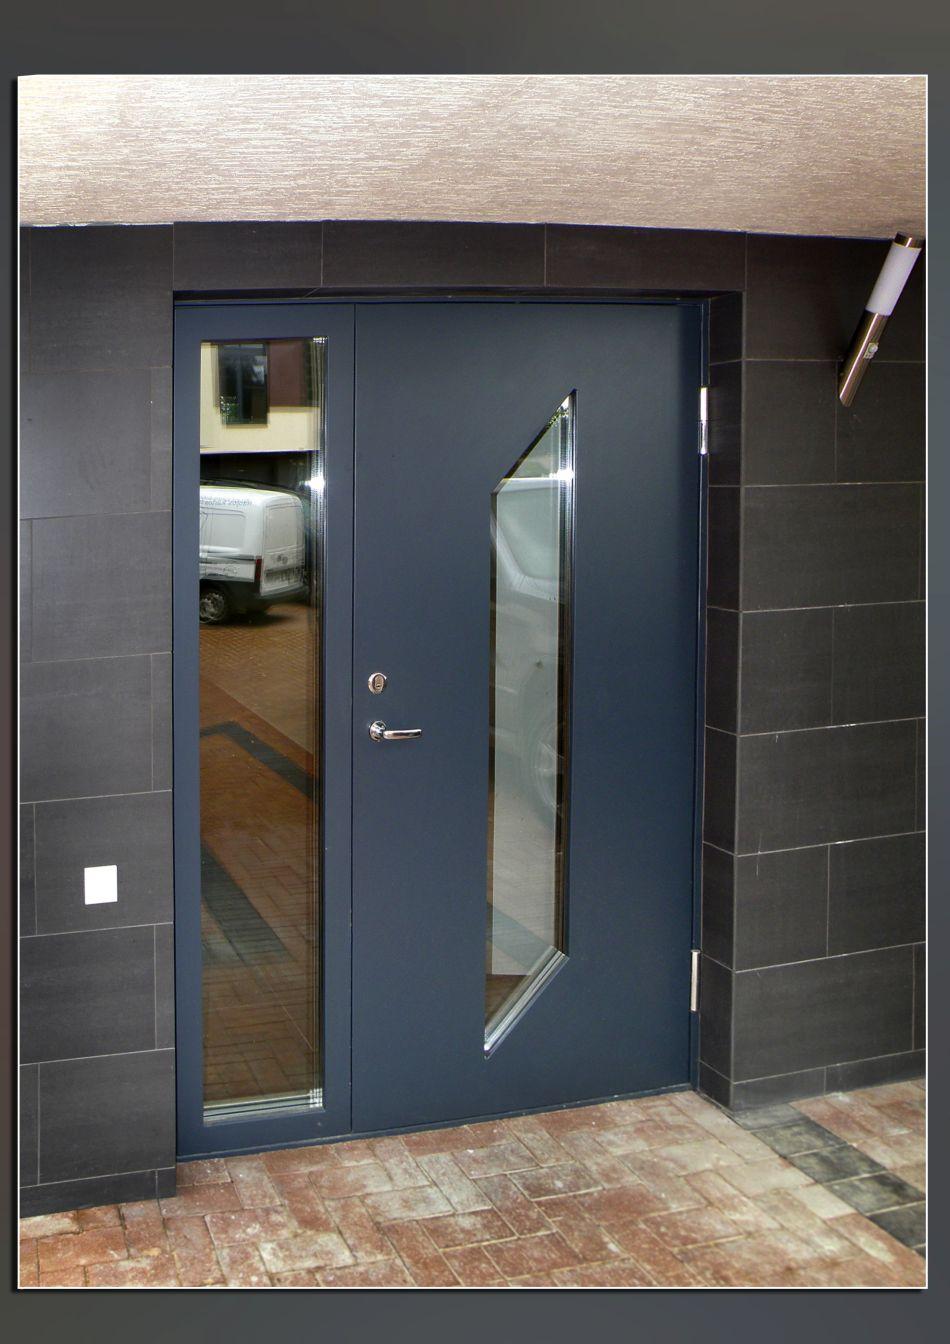 Communal Entrance Door To Stop Crime In Flats